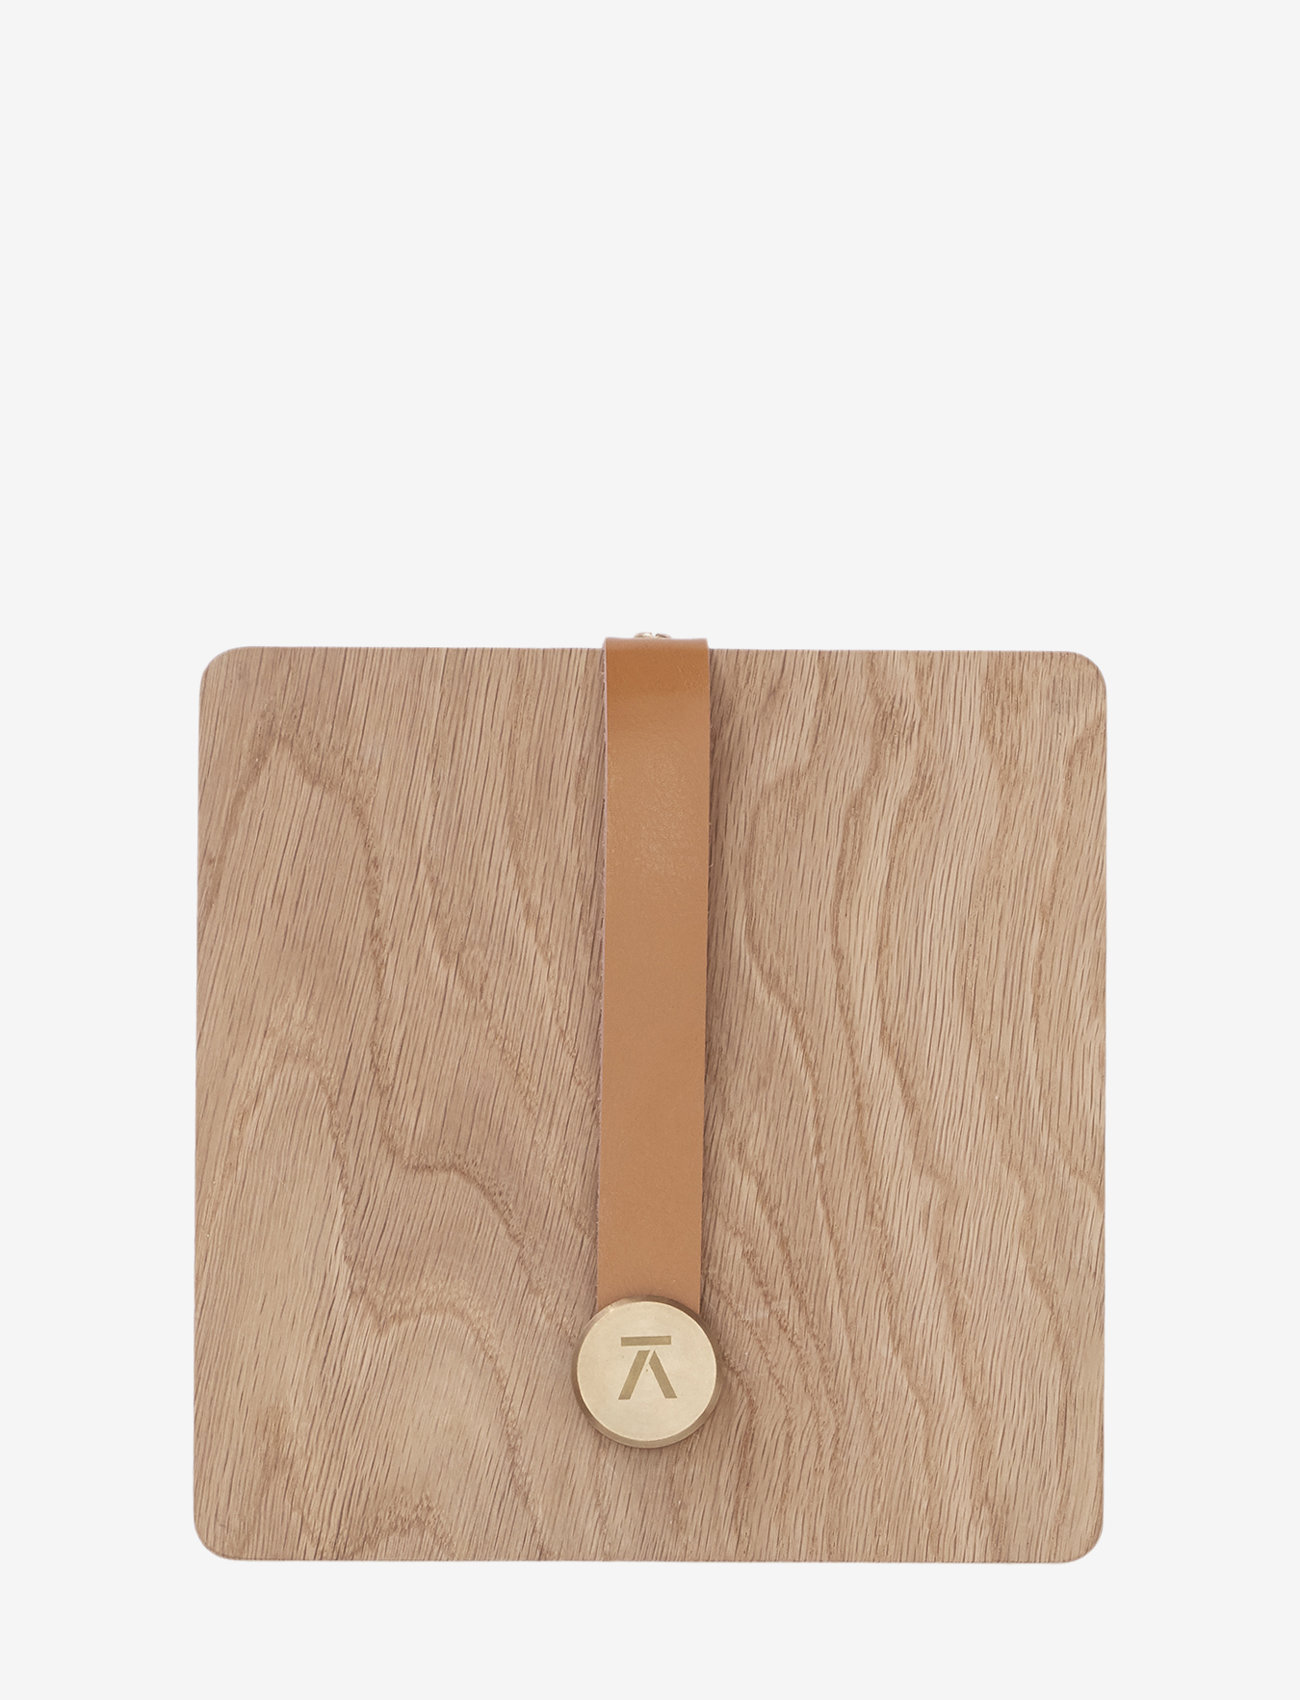 Andersen Furniture - Napkin Holder - serviettringer & serviettholdere - no color - 0